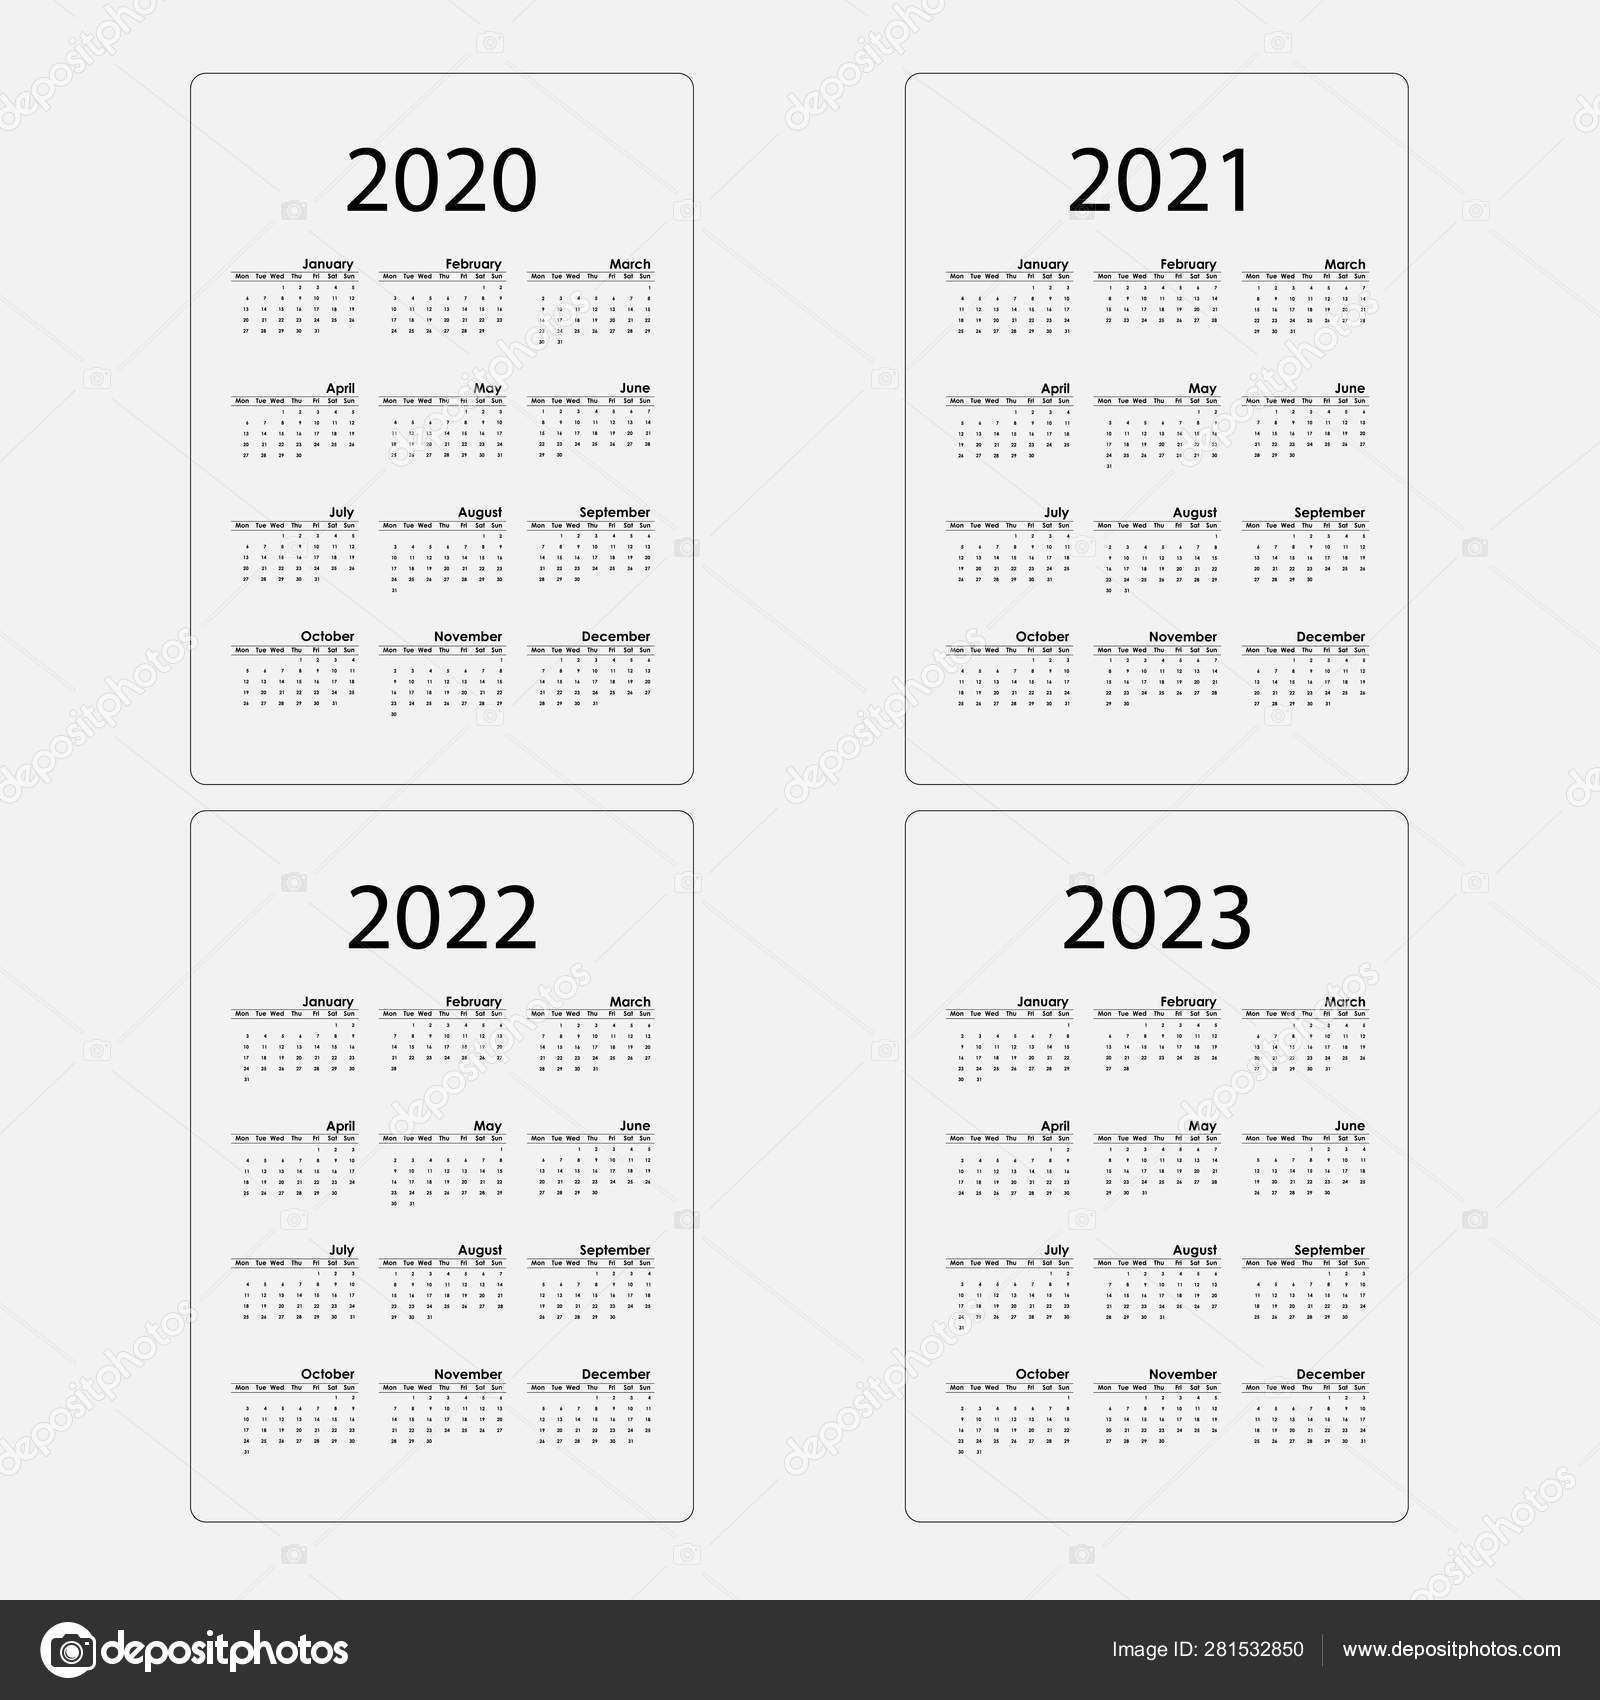 2023 Calendar 2023 Calendar : Lunar Calendar 2019